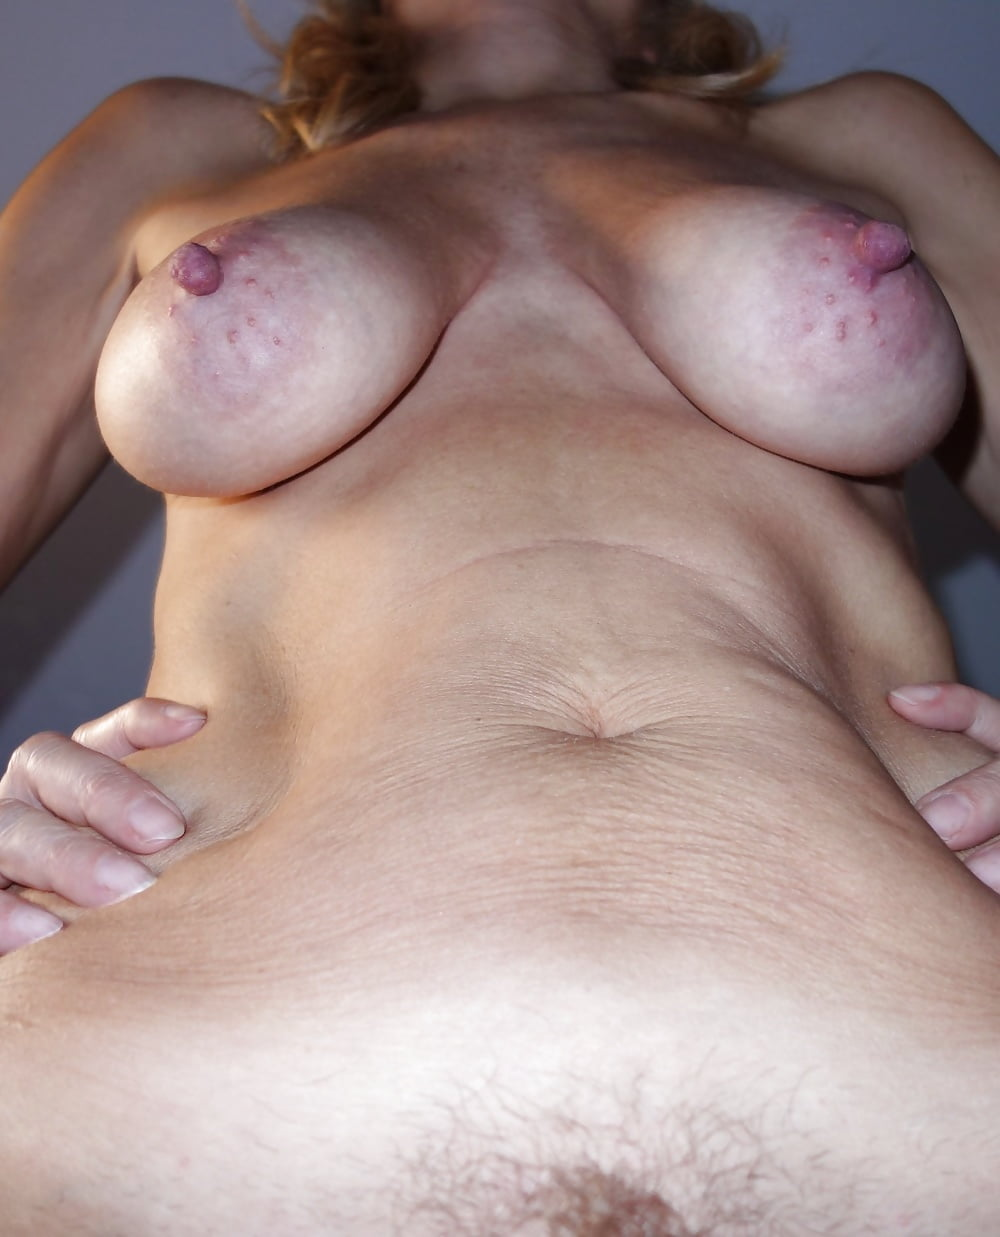 Free boobs xhamster galery pics